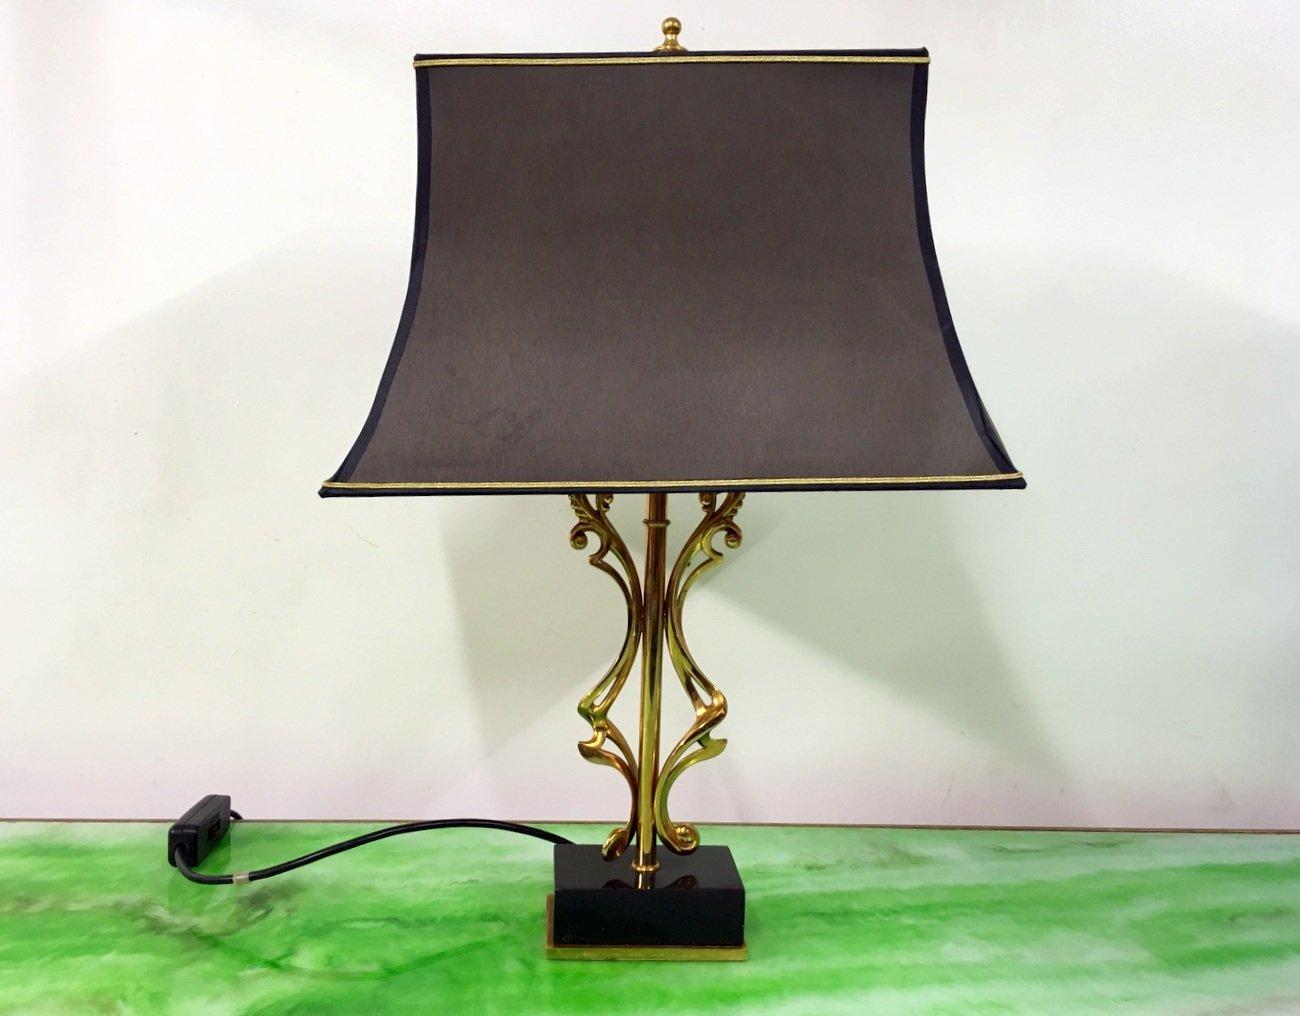 Abstrakte Messing Lampe mit Marmor Sockel